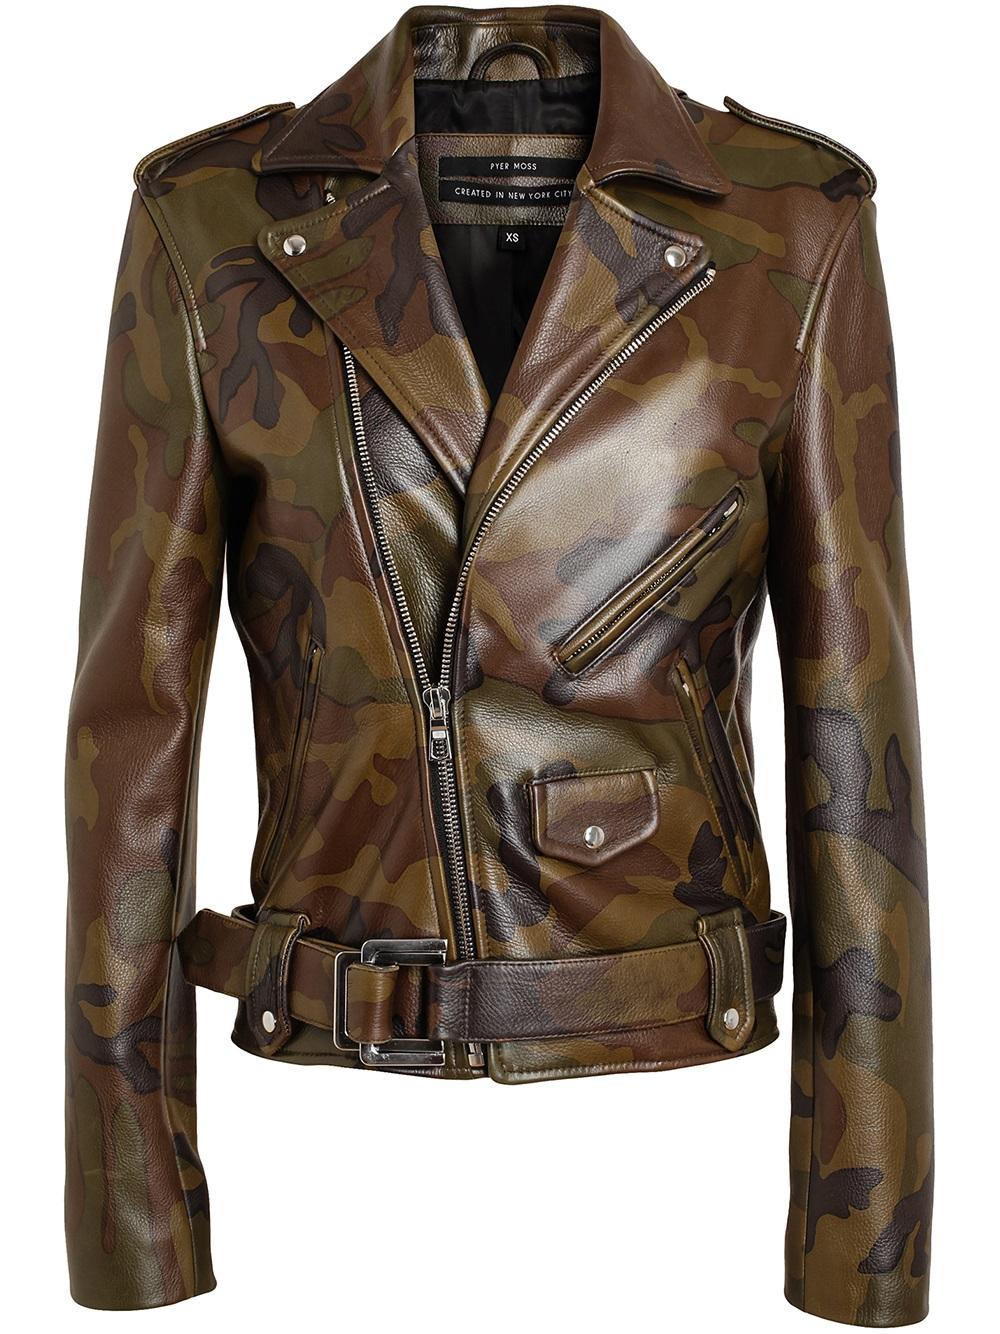 Lyst - Pyer Moss Pyer Moss Camouflage Leather Biker Jacket